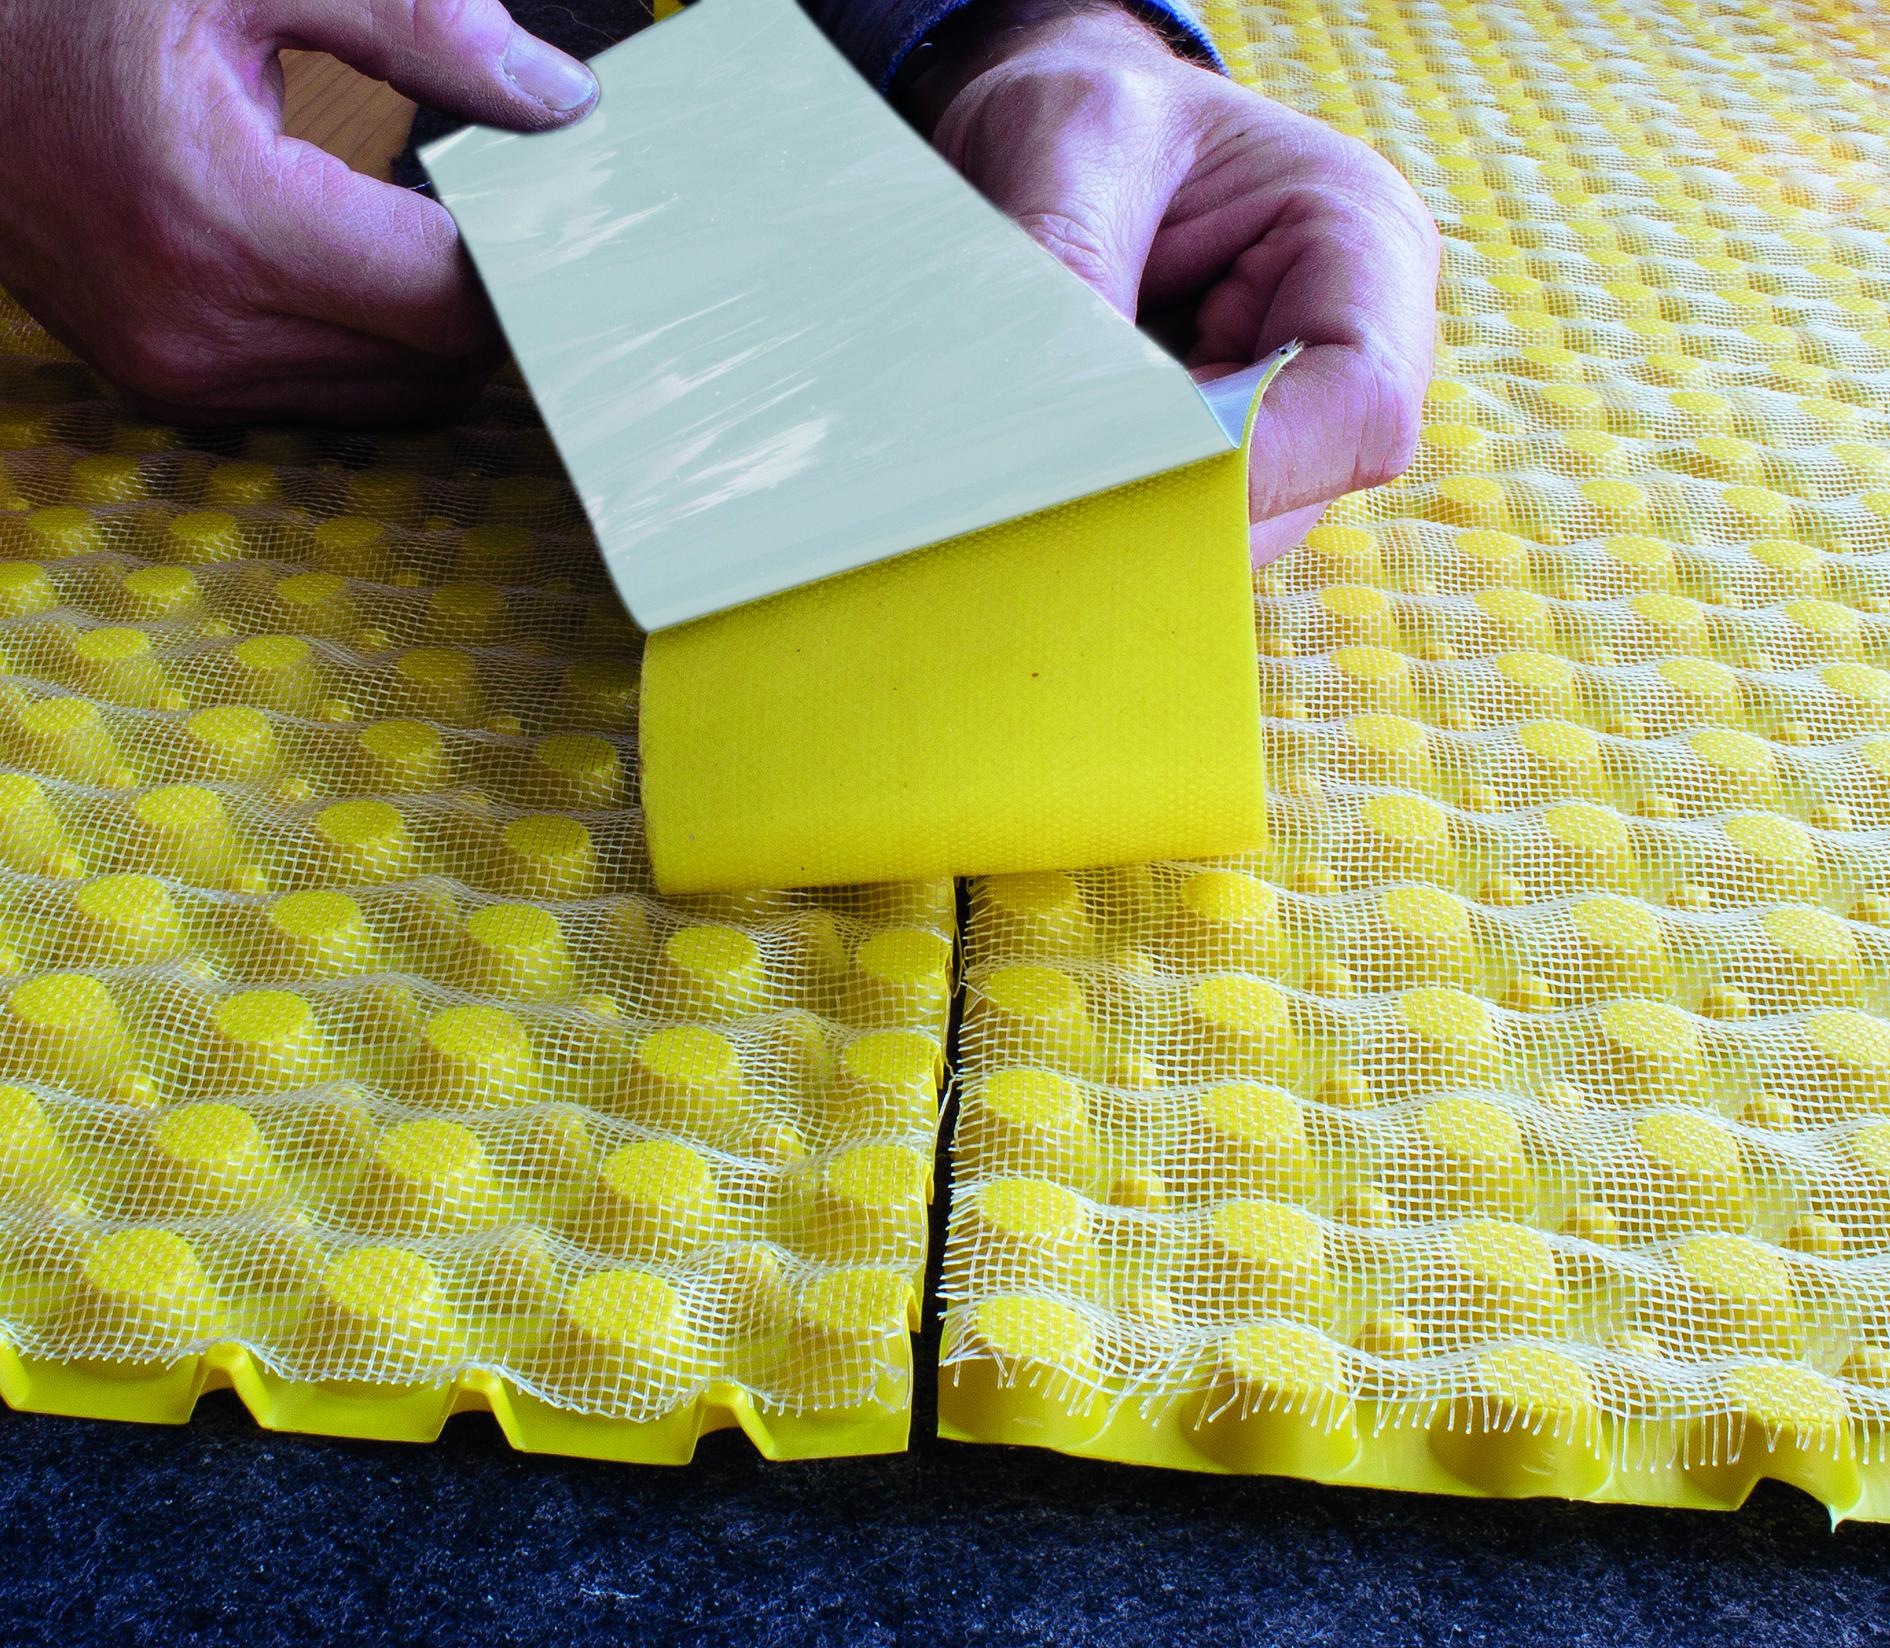 Durabase Jointing Tape 6x30 Linear Metre Rolls The Tile Bin